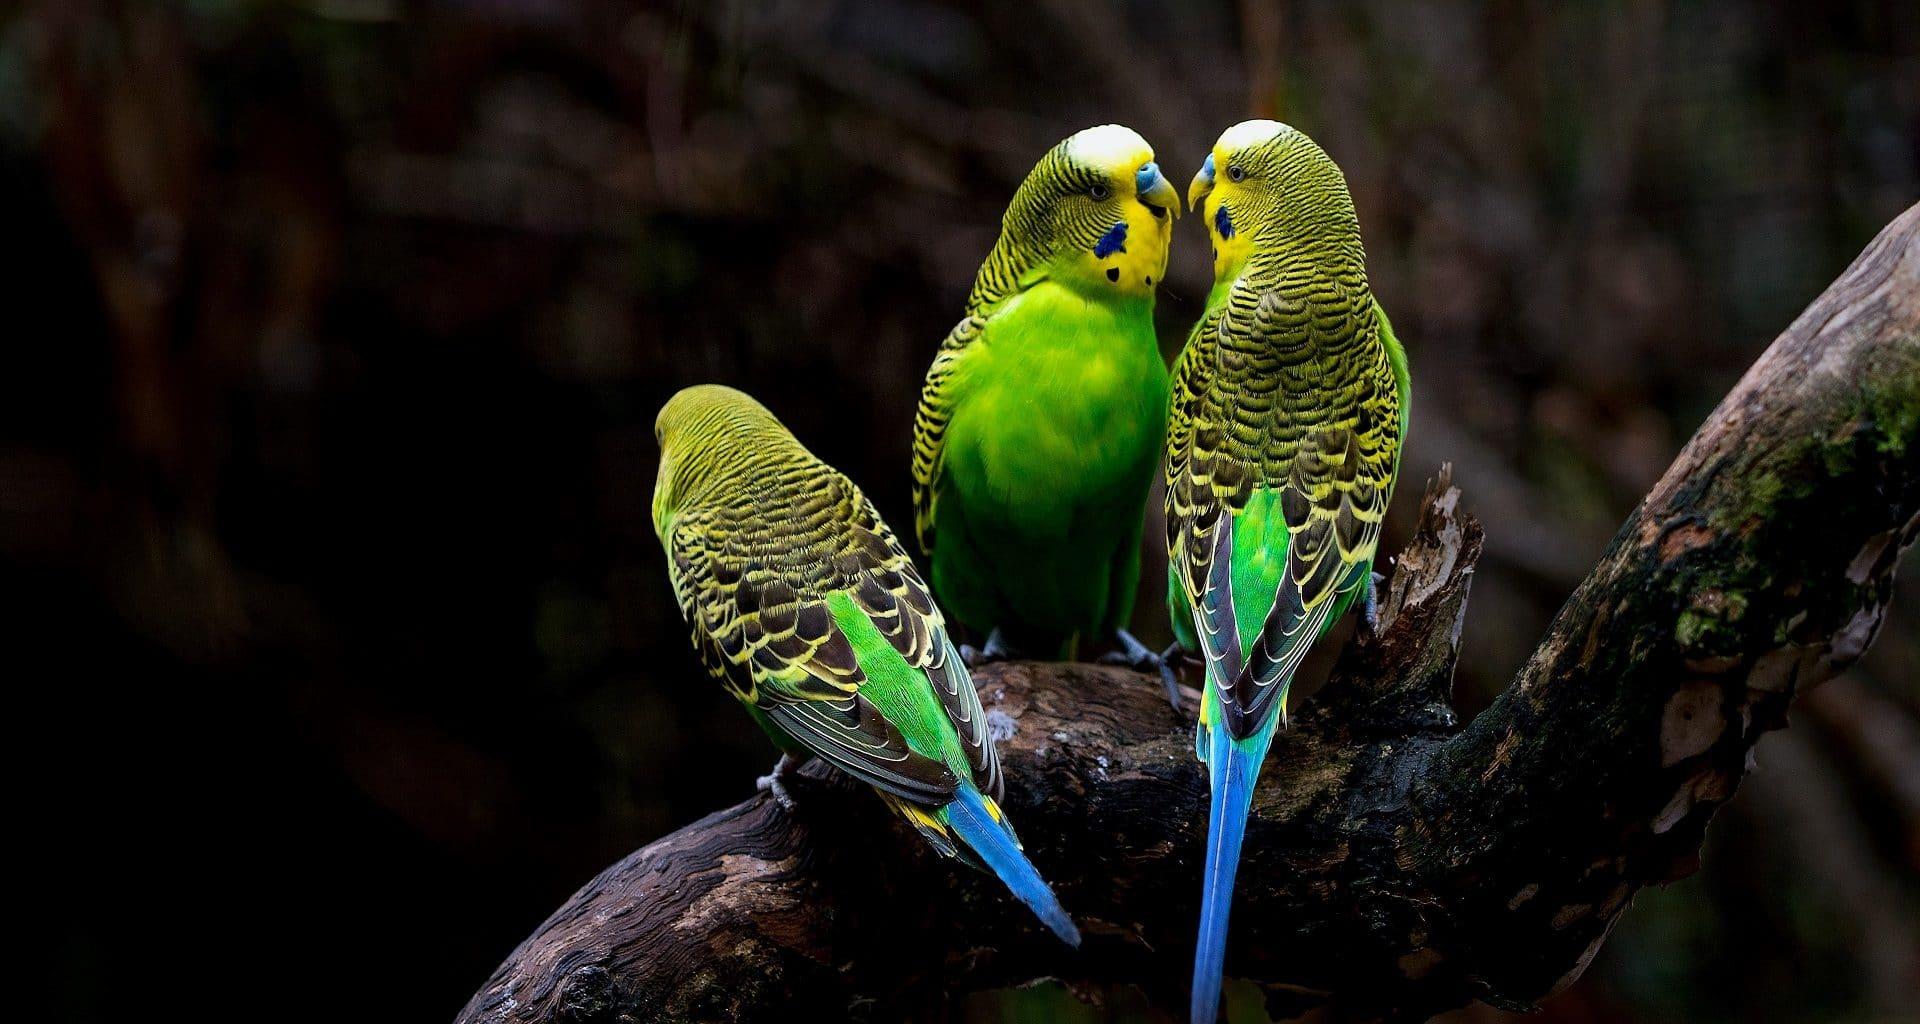 Best Parakeet Food - Featured Image